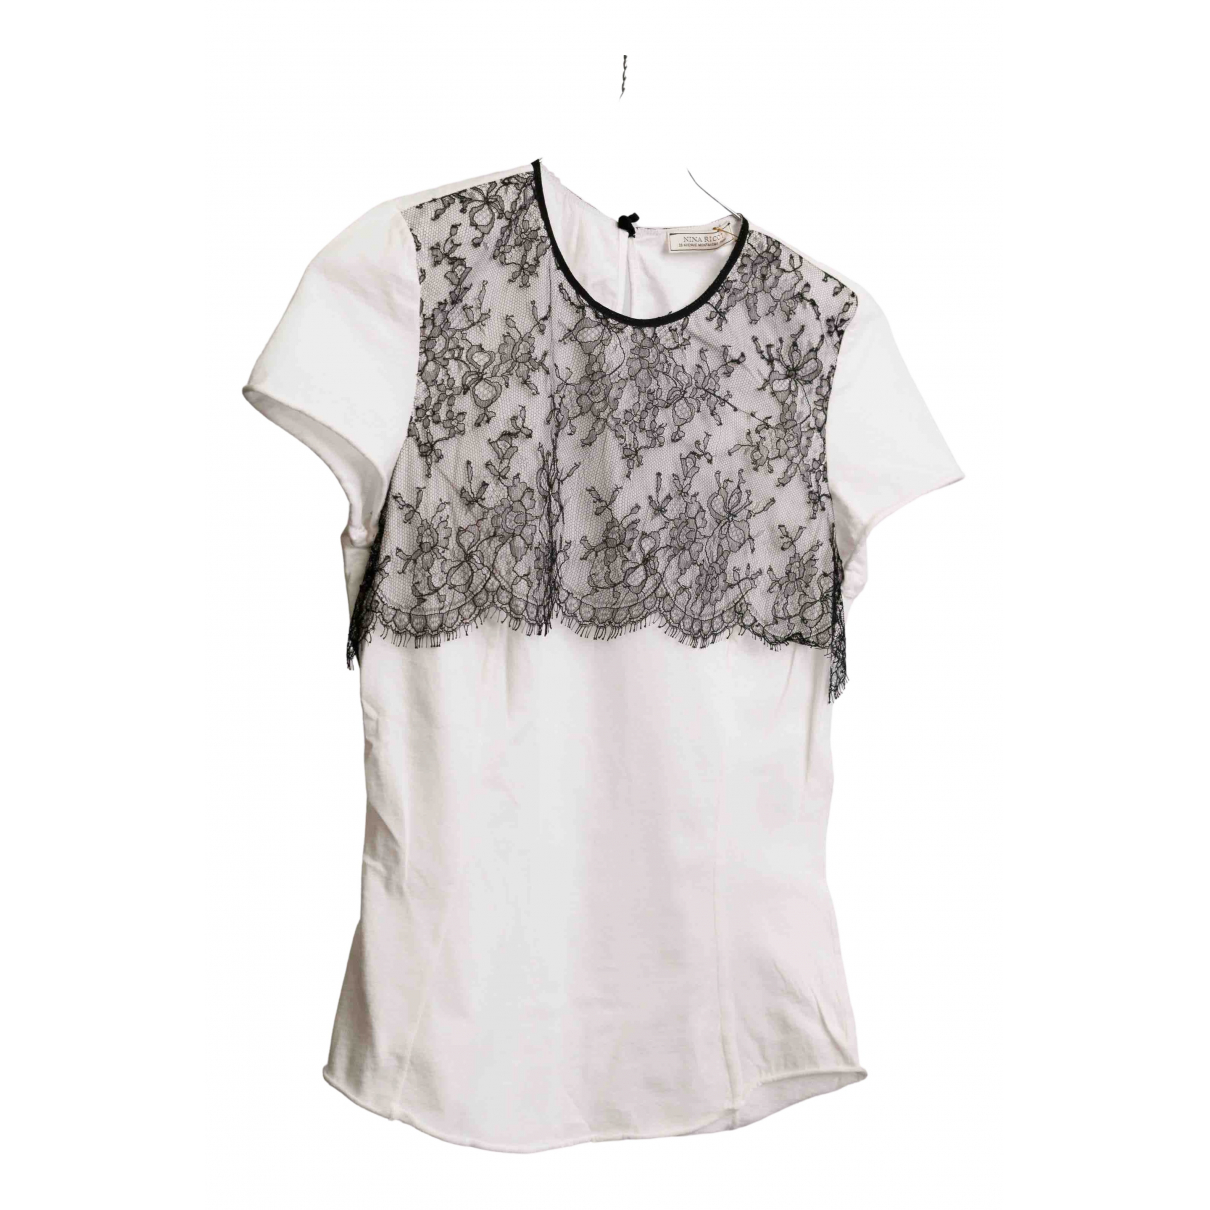 Nina Ricci - Top   pour femme en dentelle - blanc